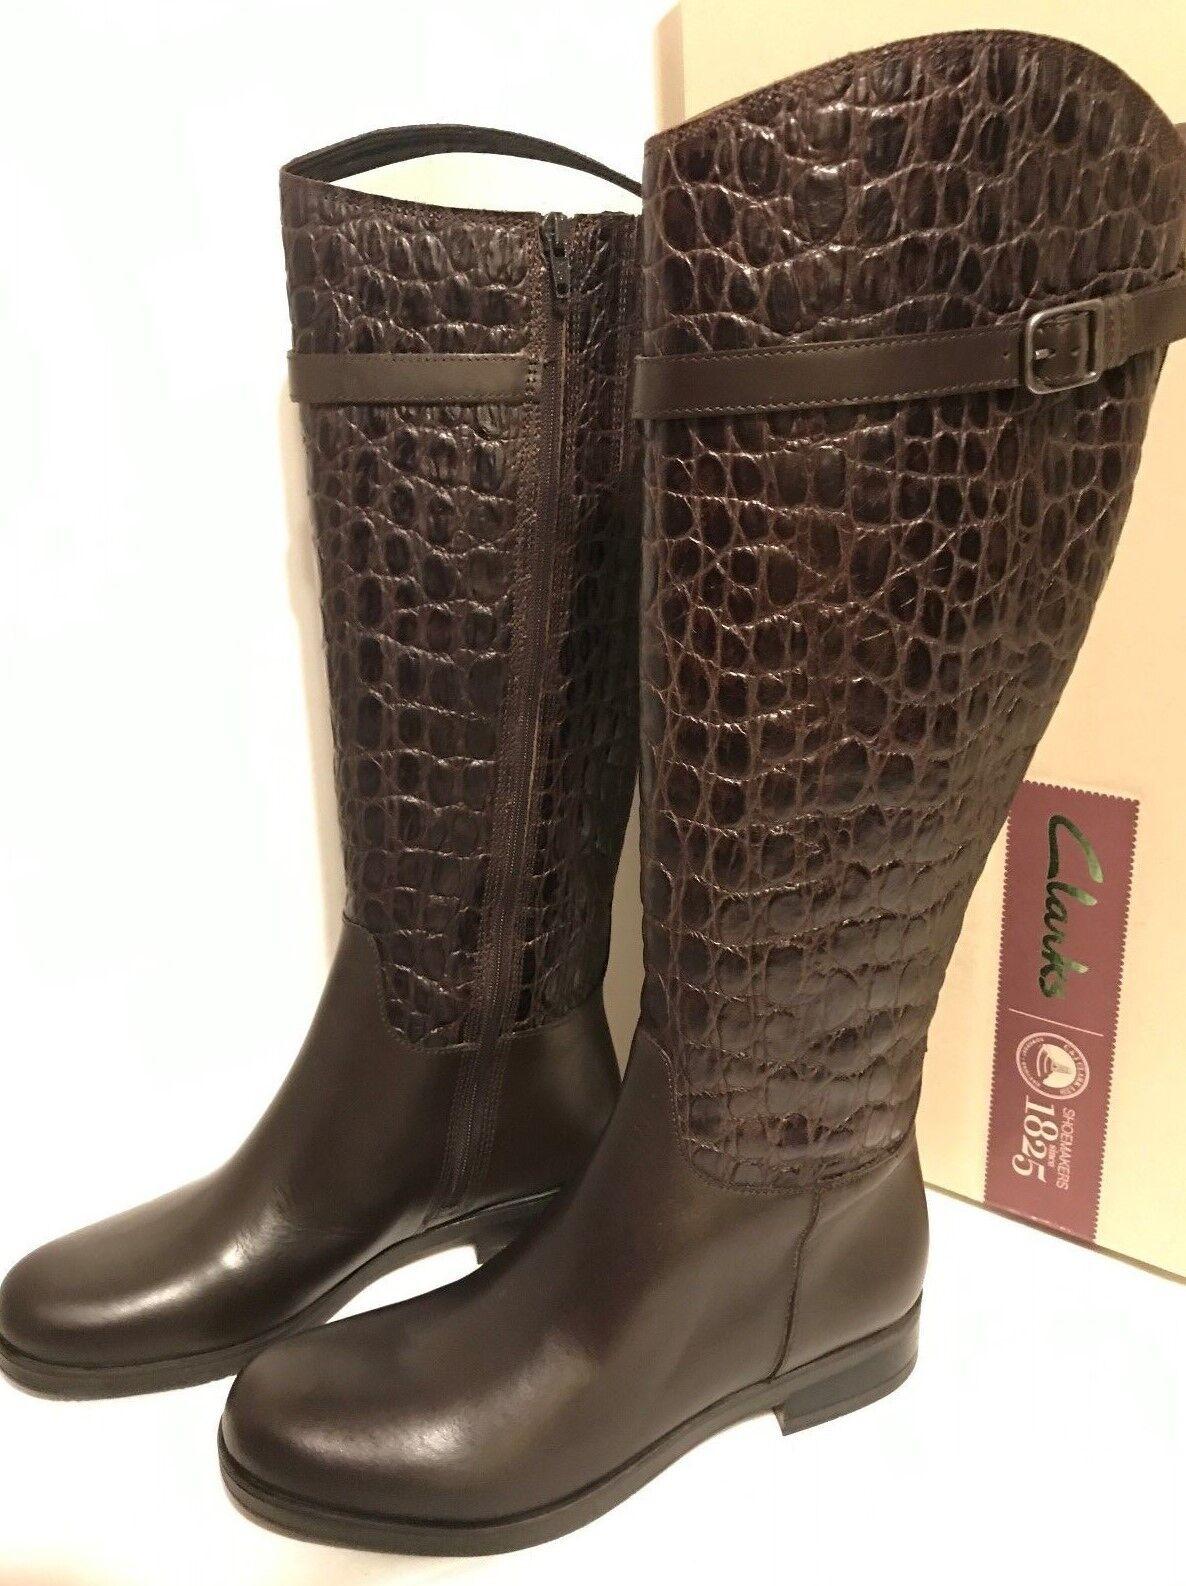 Clarks Hopedale Wish Marronee Leather Crocodile Embossed Riding Knee stivali  330